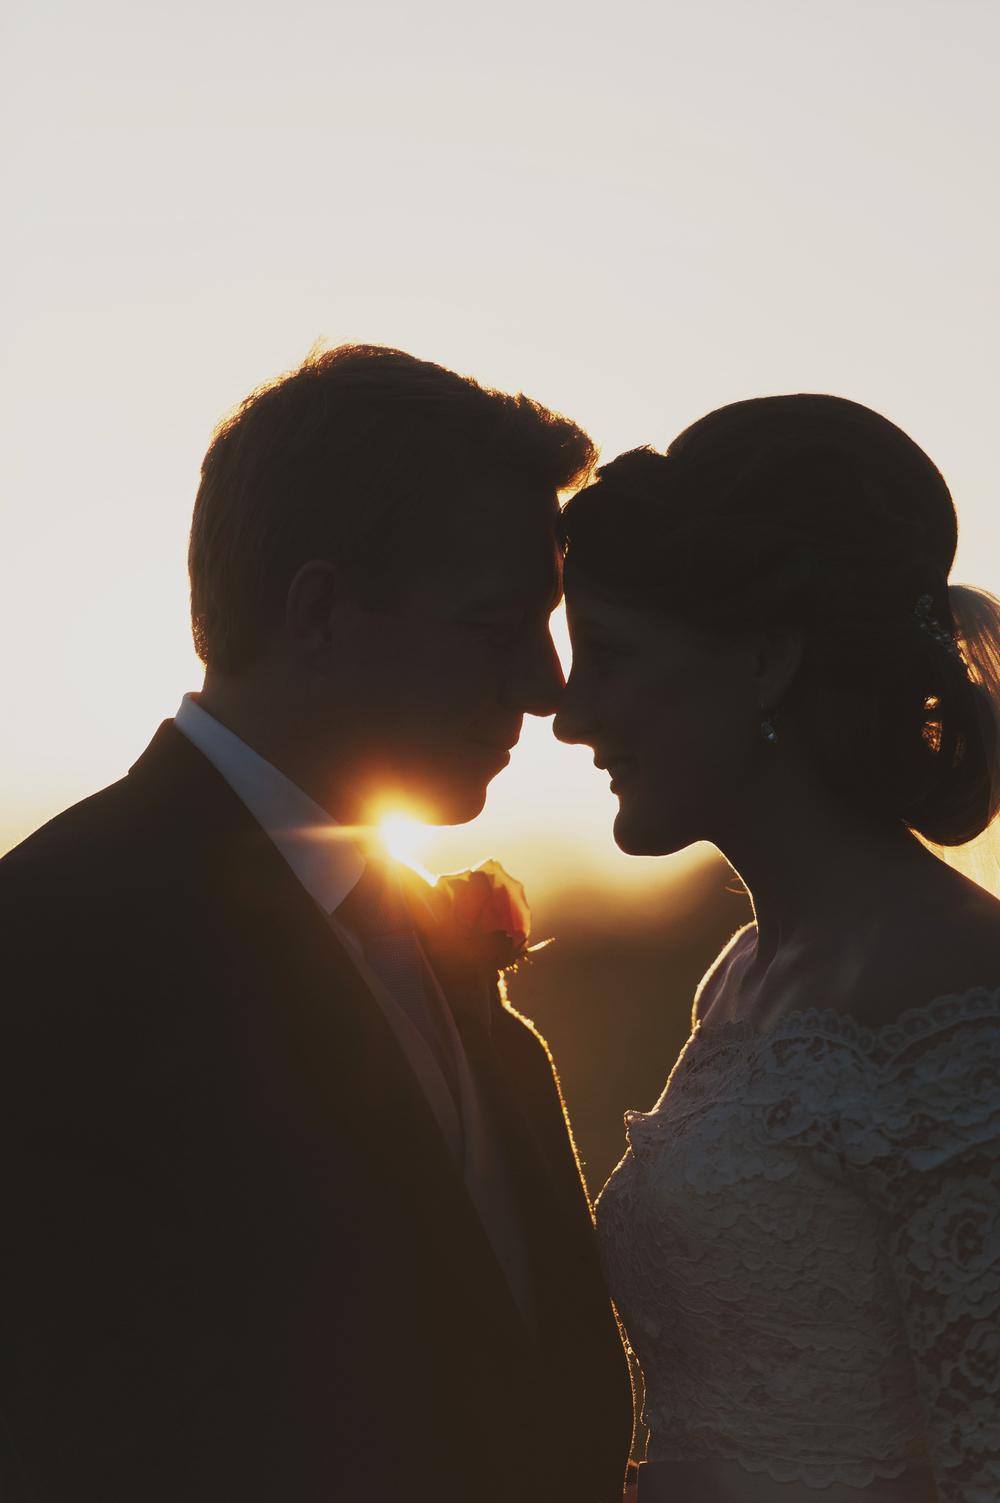 Carton_House_Wedding_Photography_Maynooth_Ireland_063.jpg